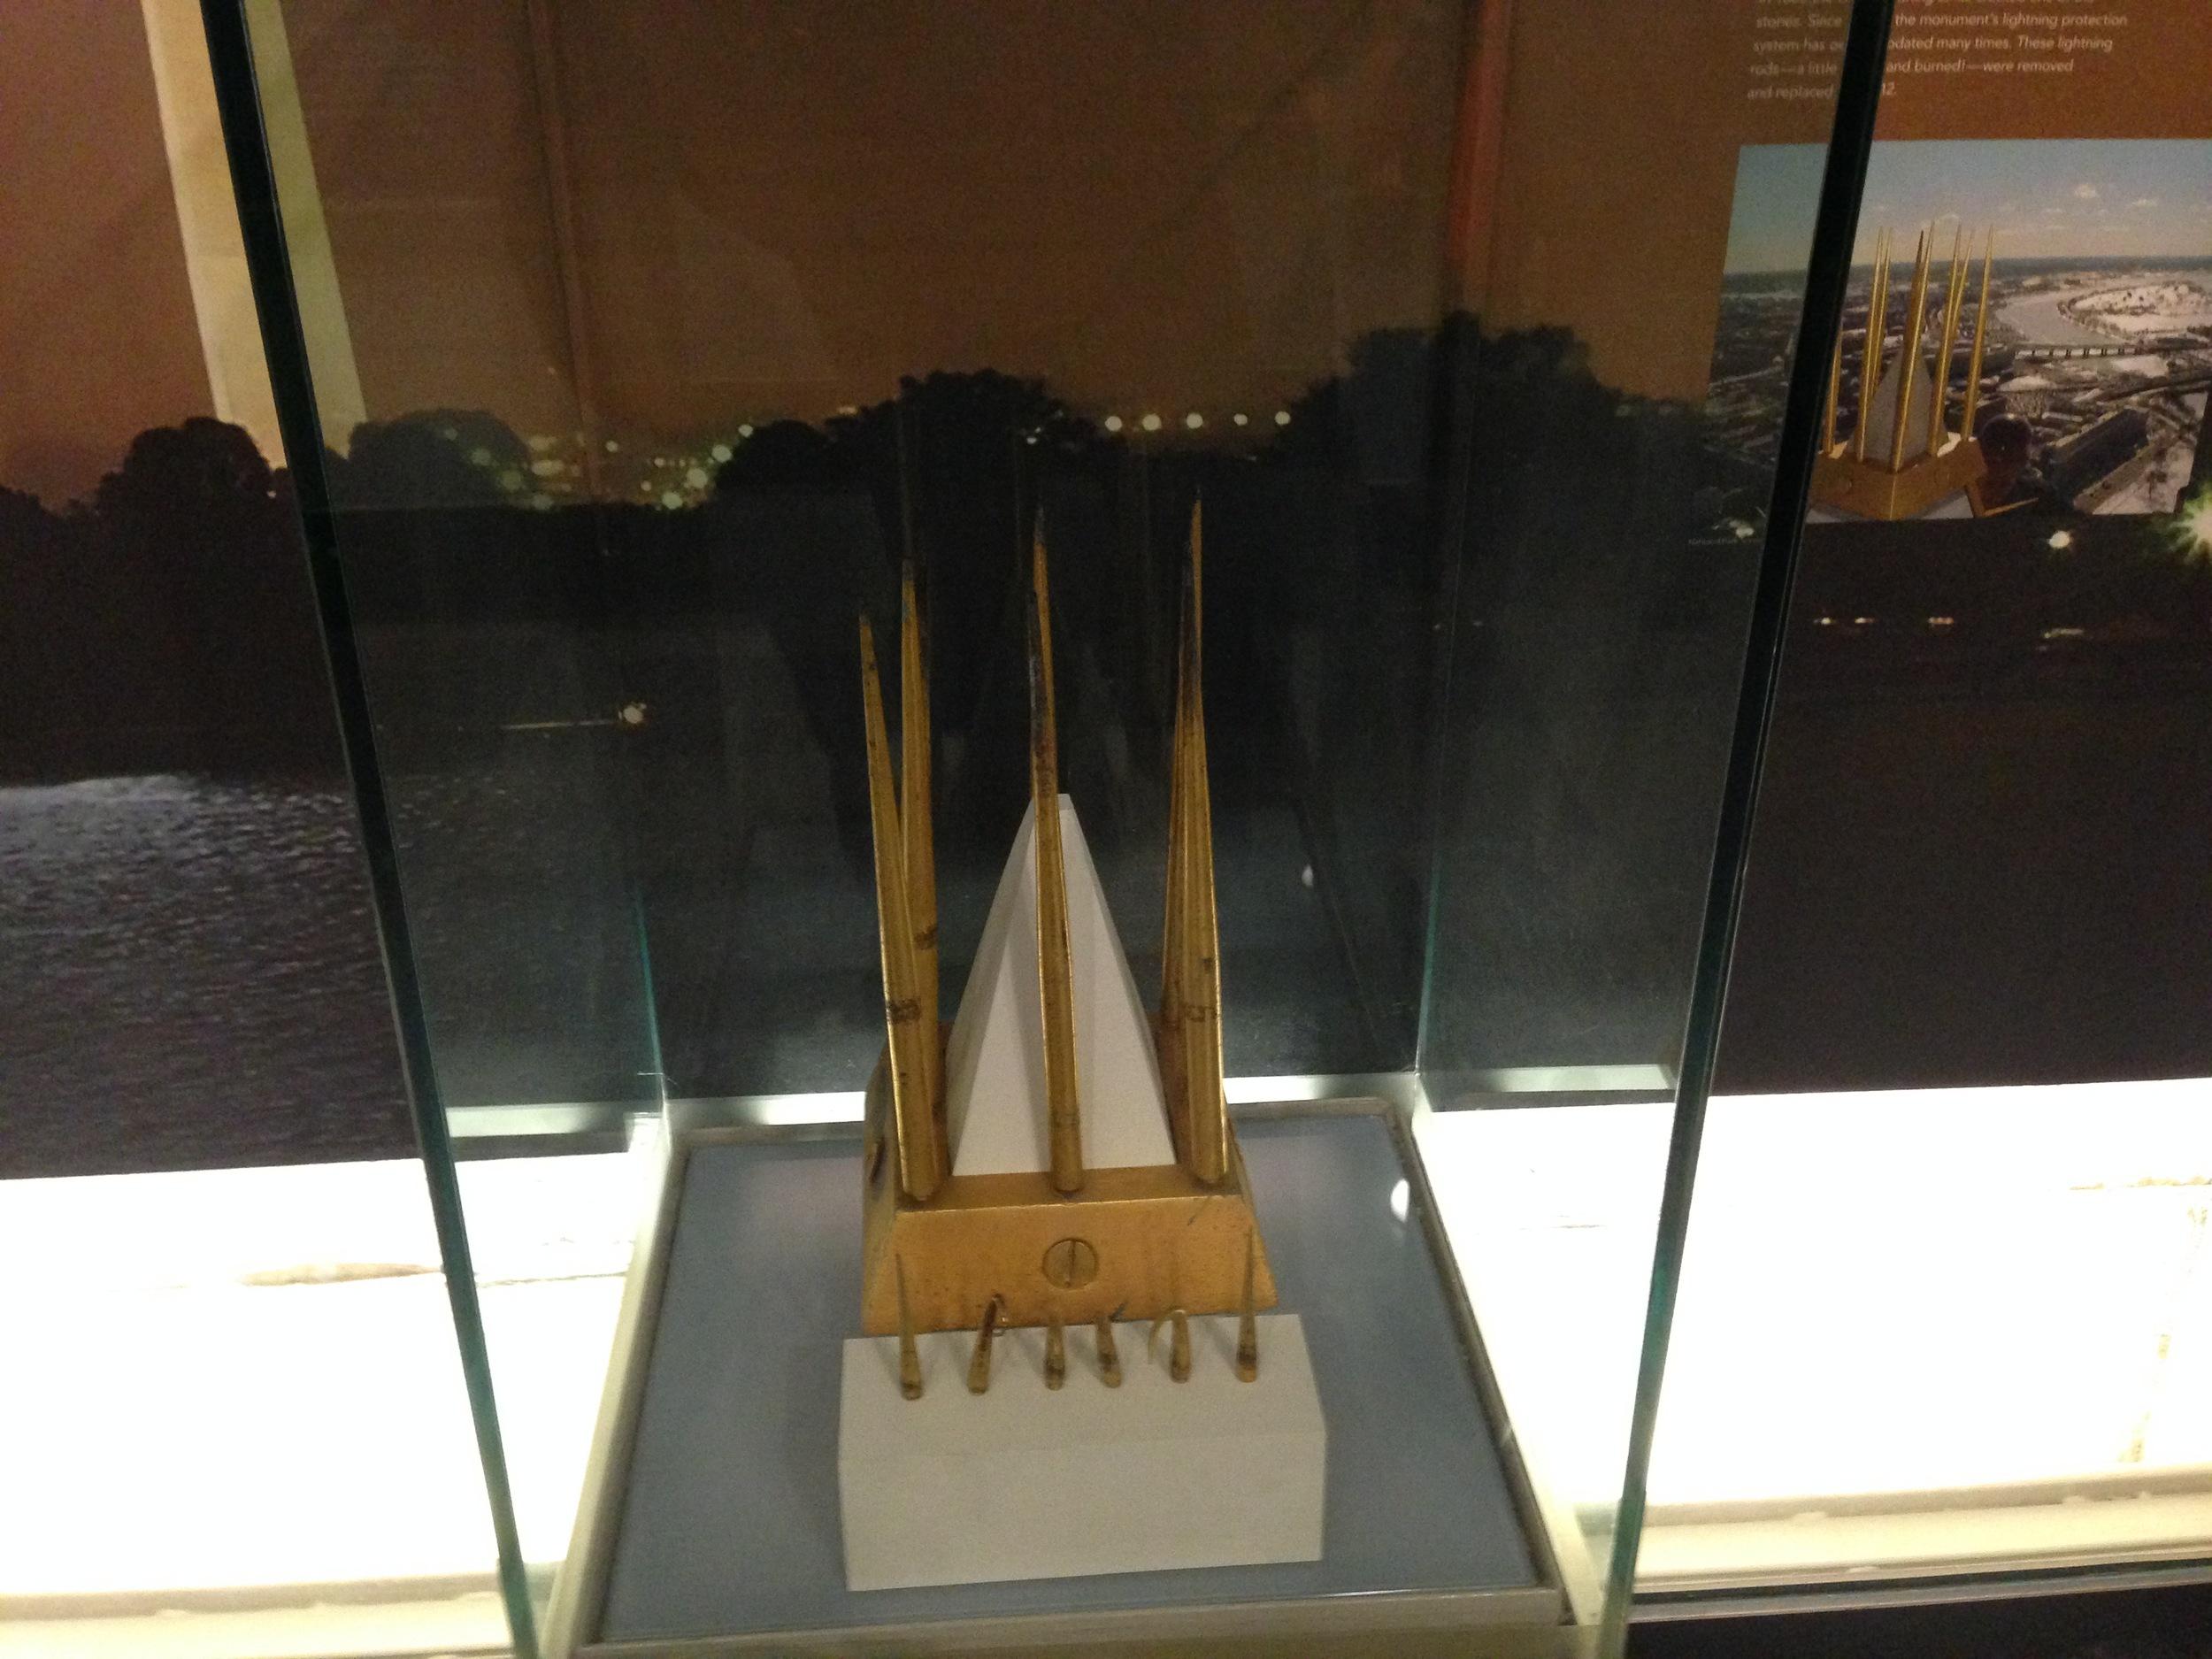 Spent lightning rod display at the Washington Monument.